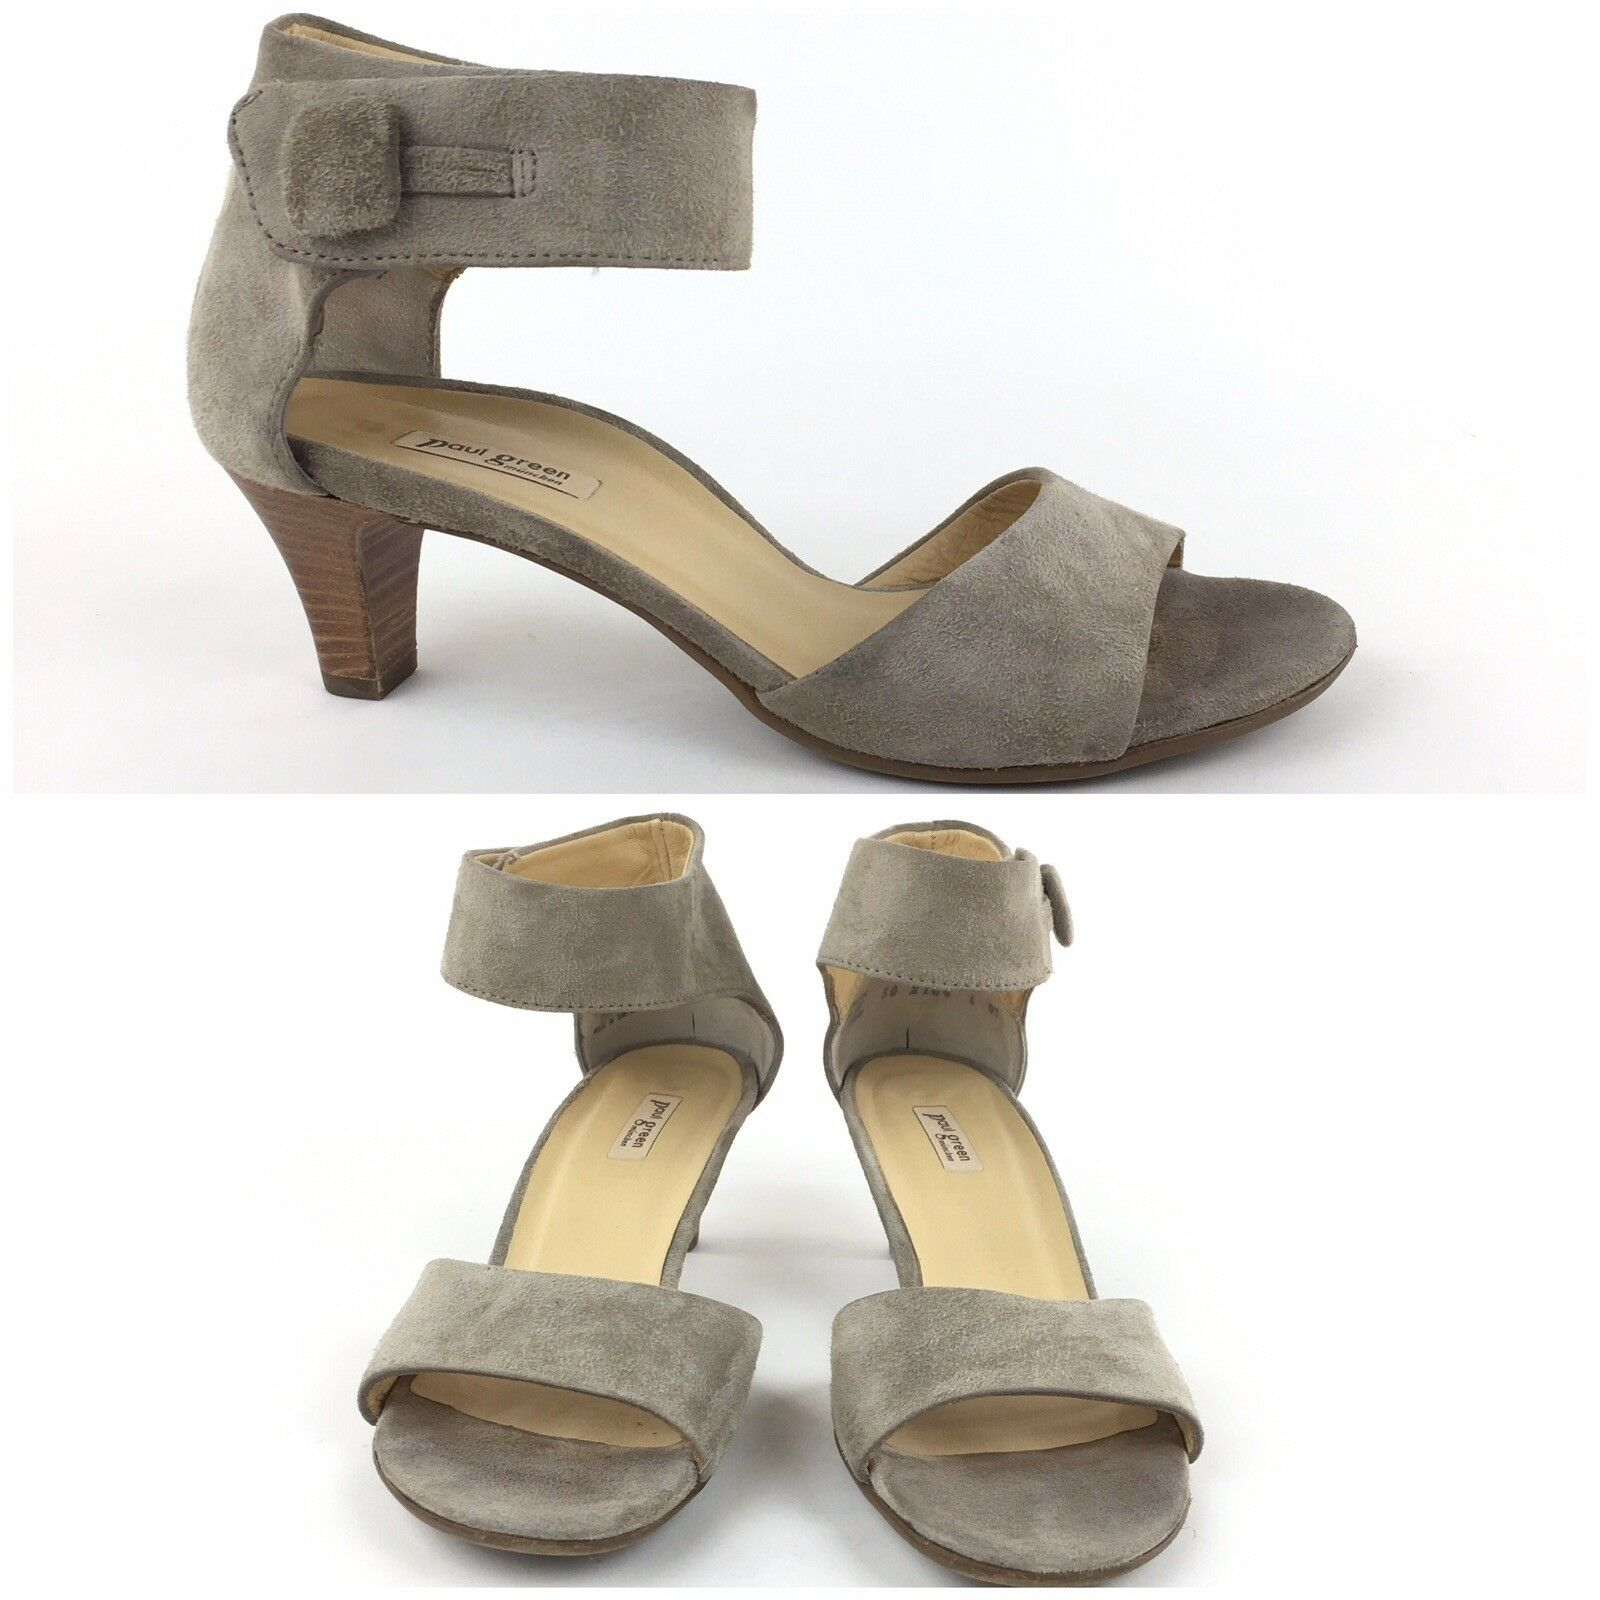 Paul Green Maya Pumps US 6.5 Ankle Strap Suede